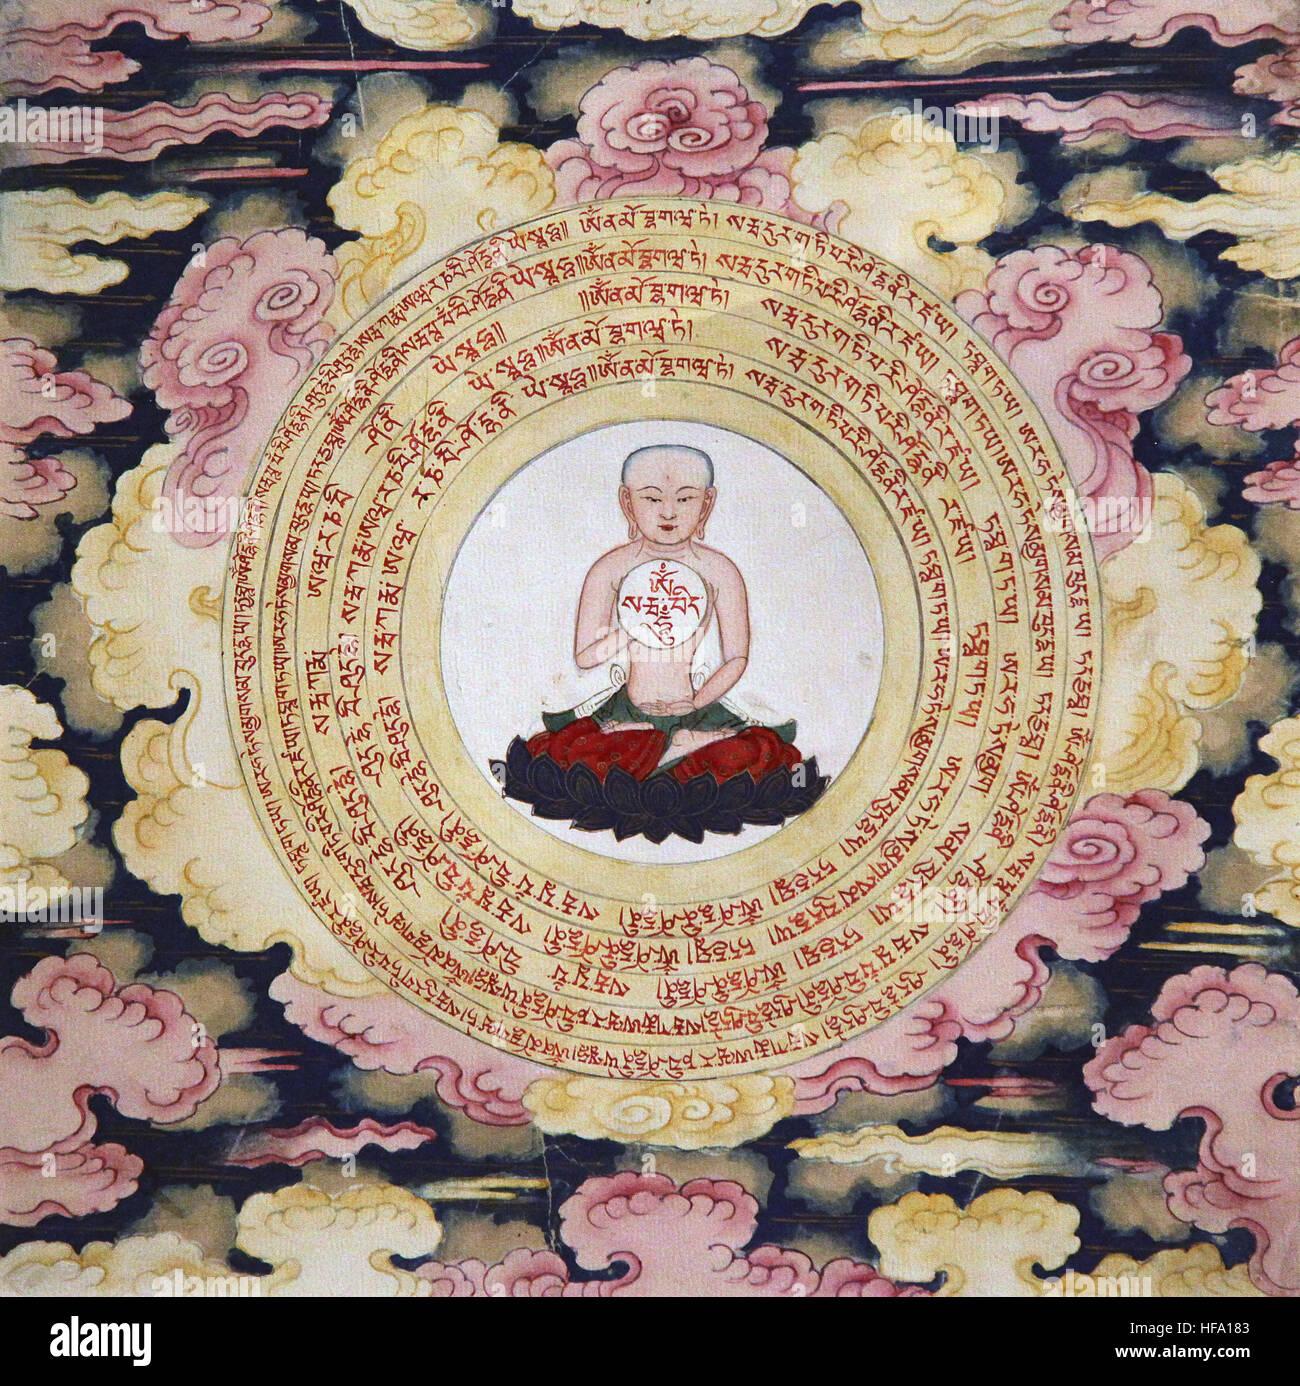 Buddhist tibetan vajrayana meditation painting 18th century buddha and mind yoga mindfulness  Purification - Stock Image